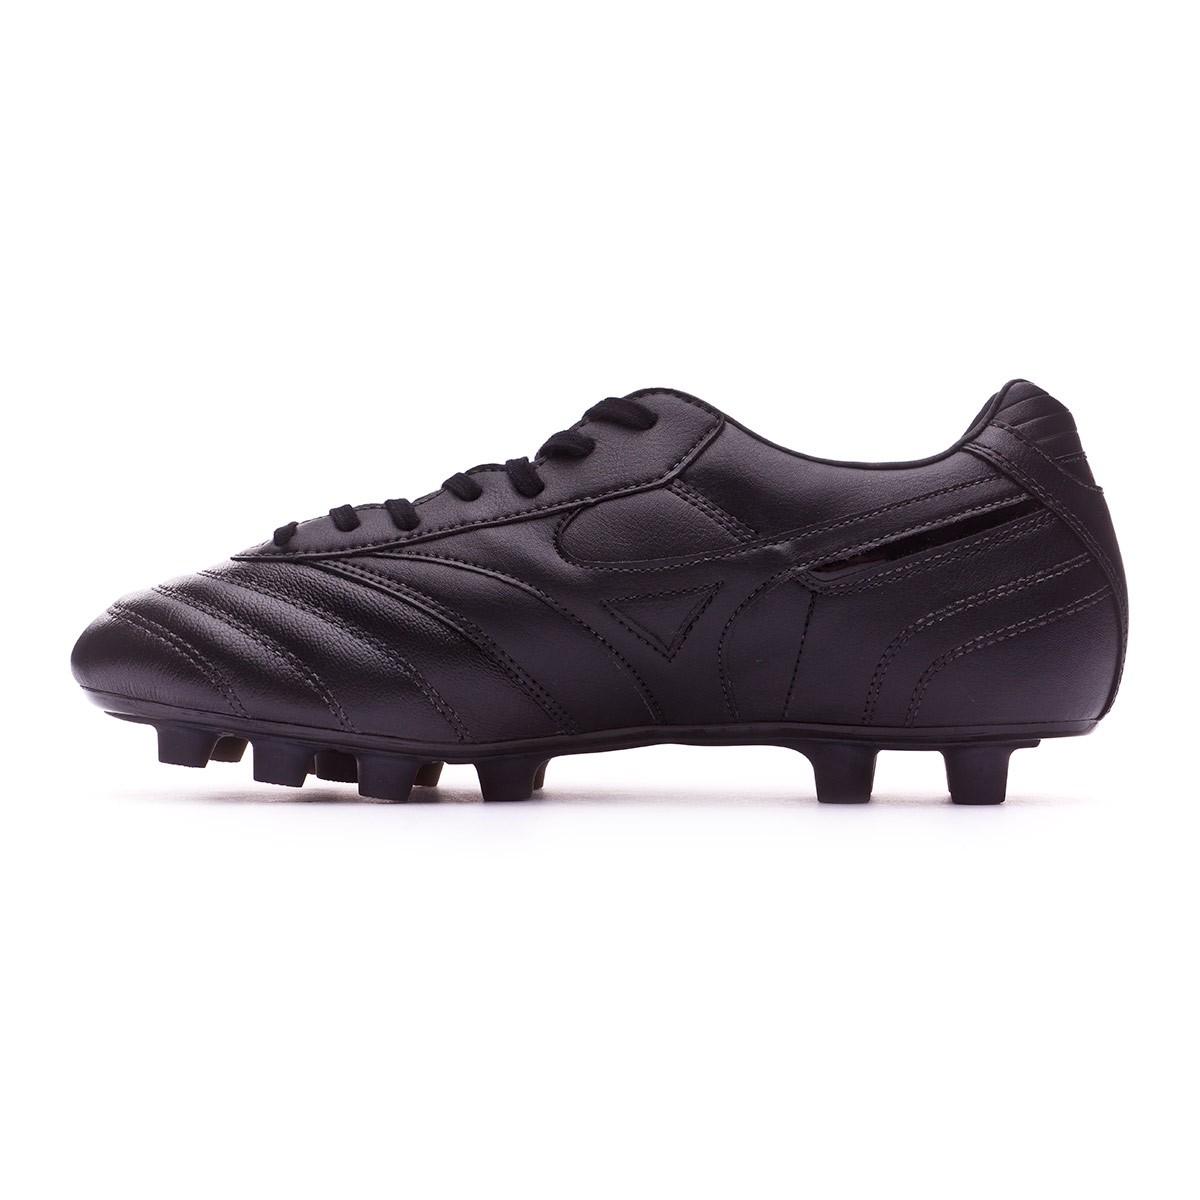 Scarpe Mizuno Morelia Classic MD Black - Negozio di calcio Fútbol Emotion 9d96ee5b691